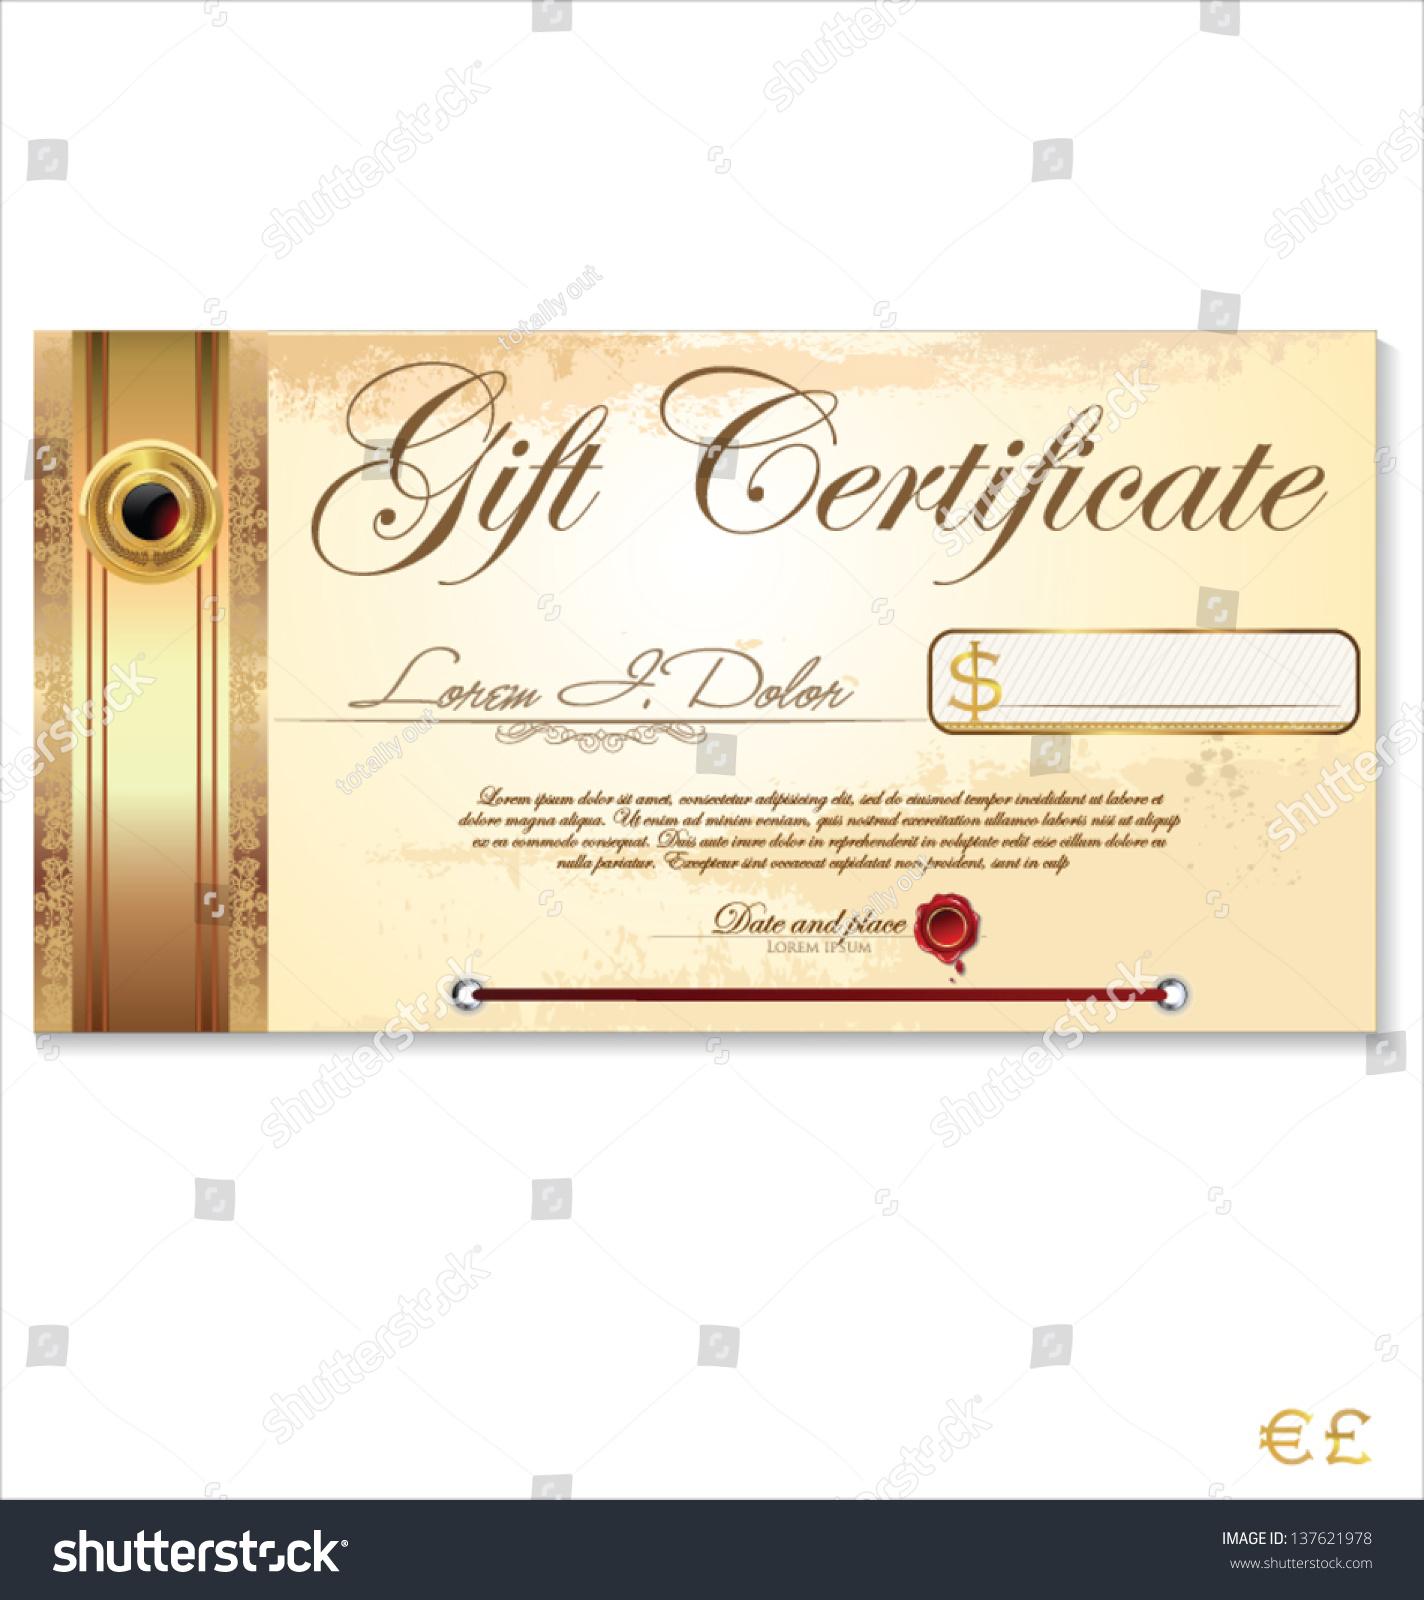 Luxury Gift Certificate Template Stock Vector (2018) 137621978 ...